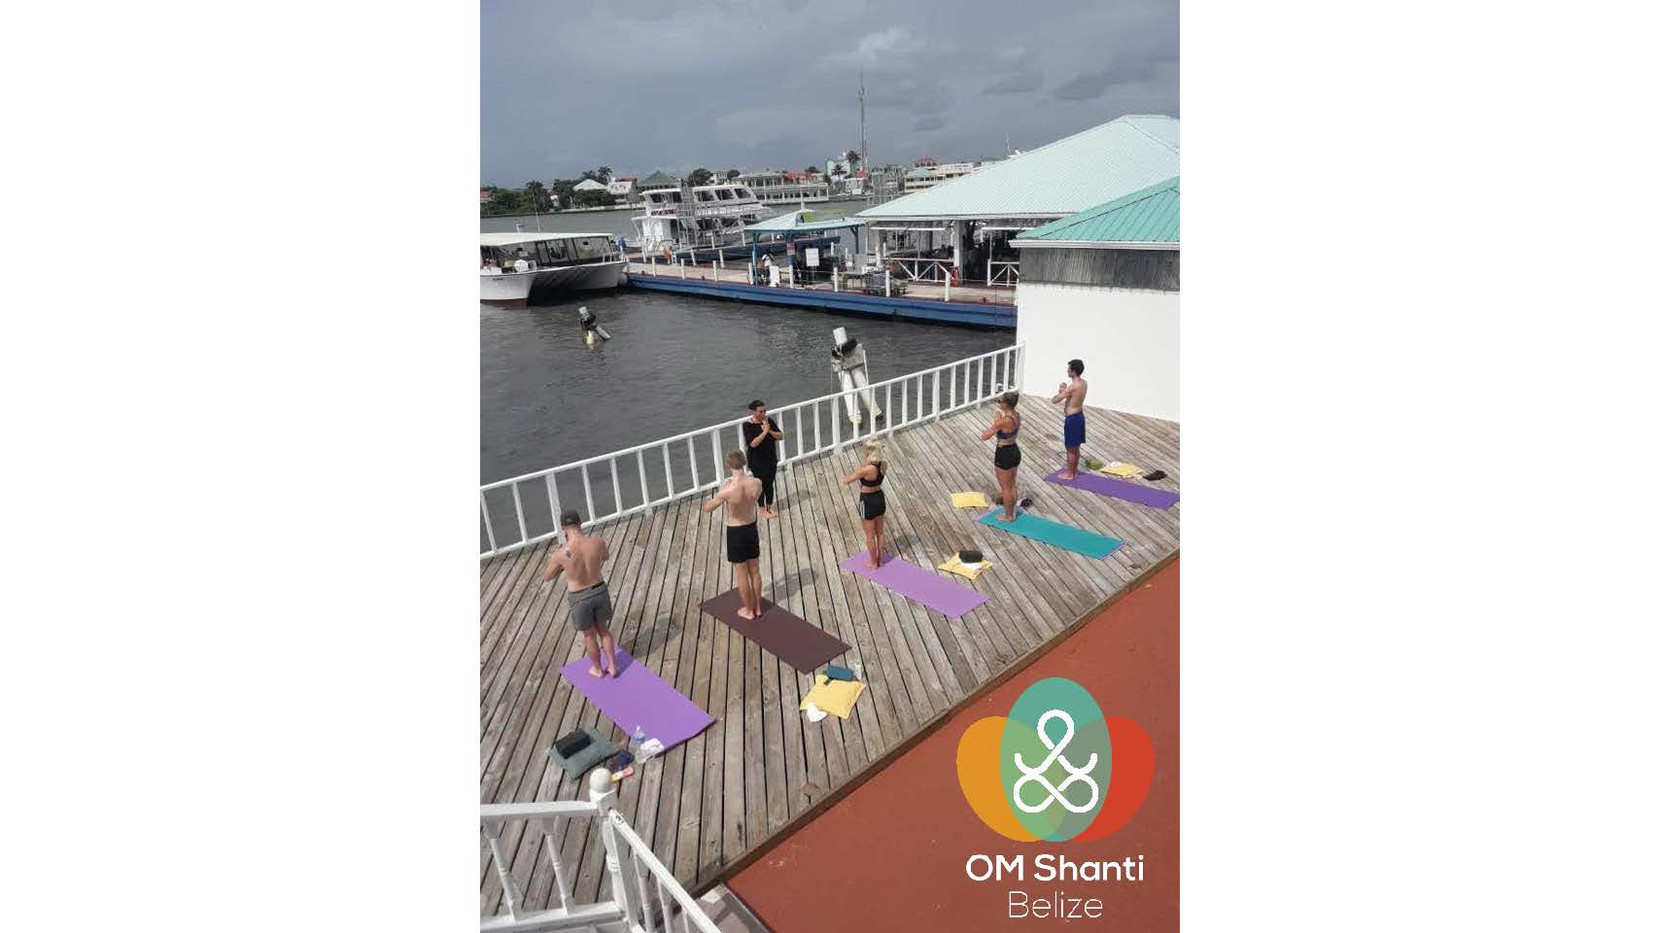 Om Shanti Belize Design Guidelines Reduc